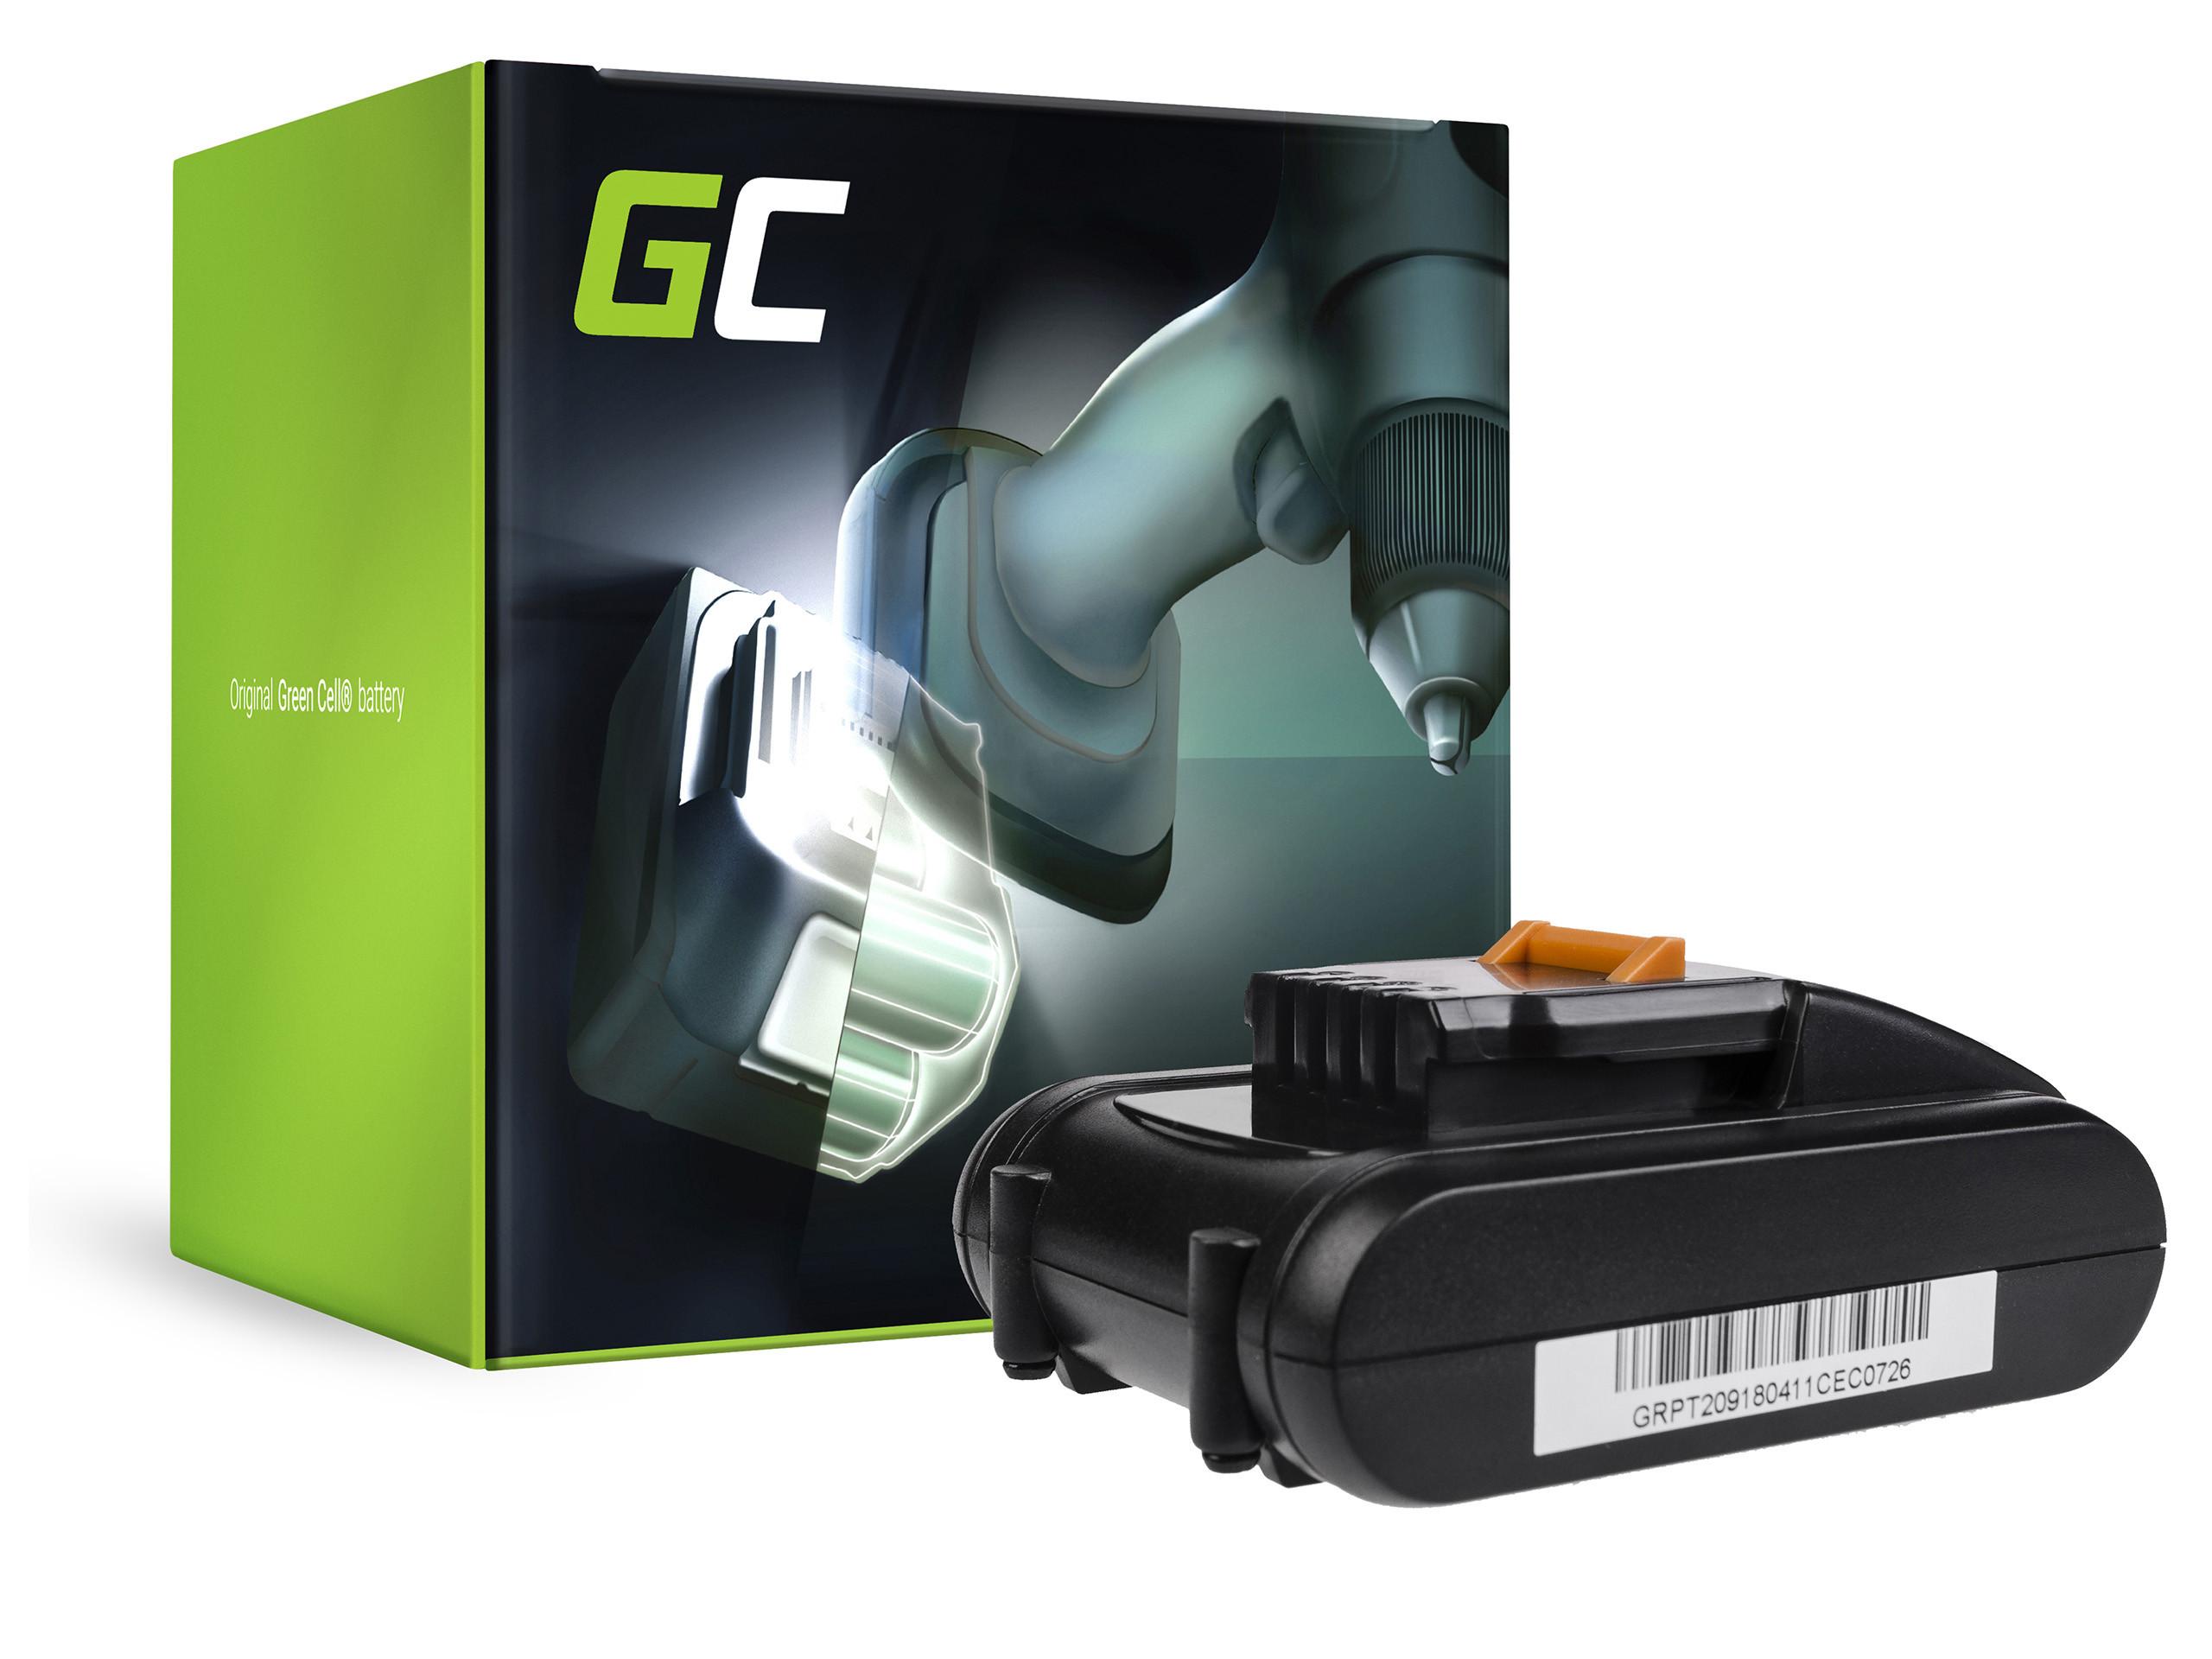 Green Cell PT209 Baterie Worx WA3527 WA3539, WORX WX152 WX152.1 WX152.2 WX152.3 WX156 WX156.1 WX373 2Ah 16V Li-ion - neoriginální